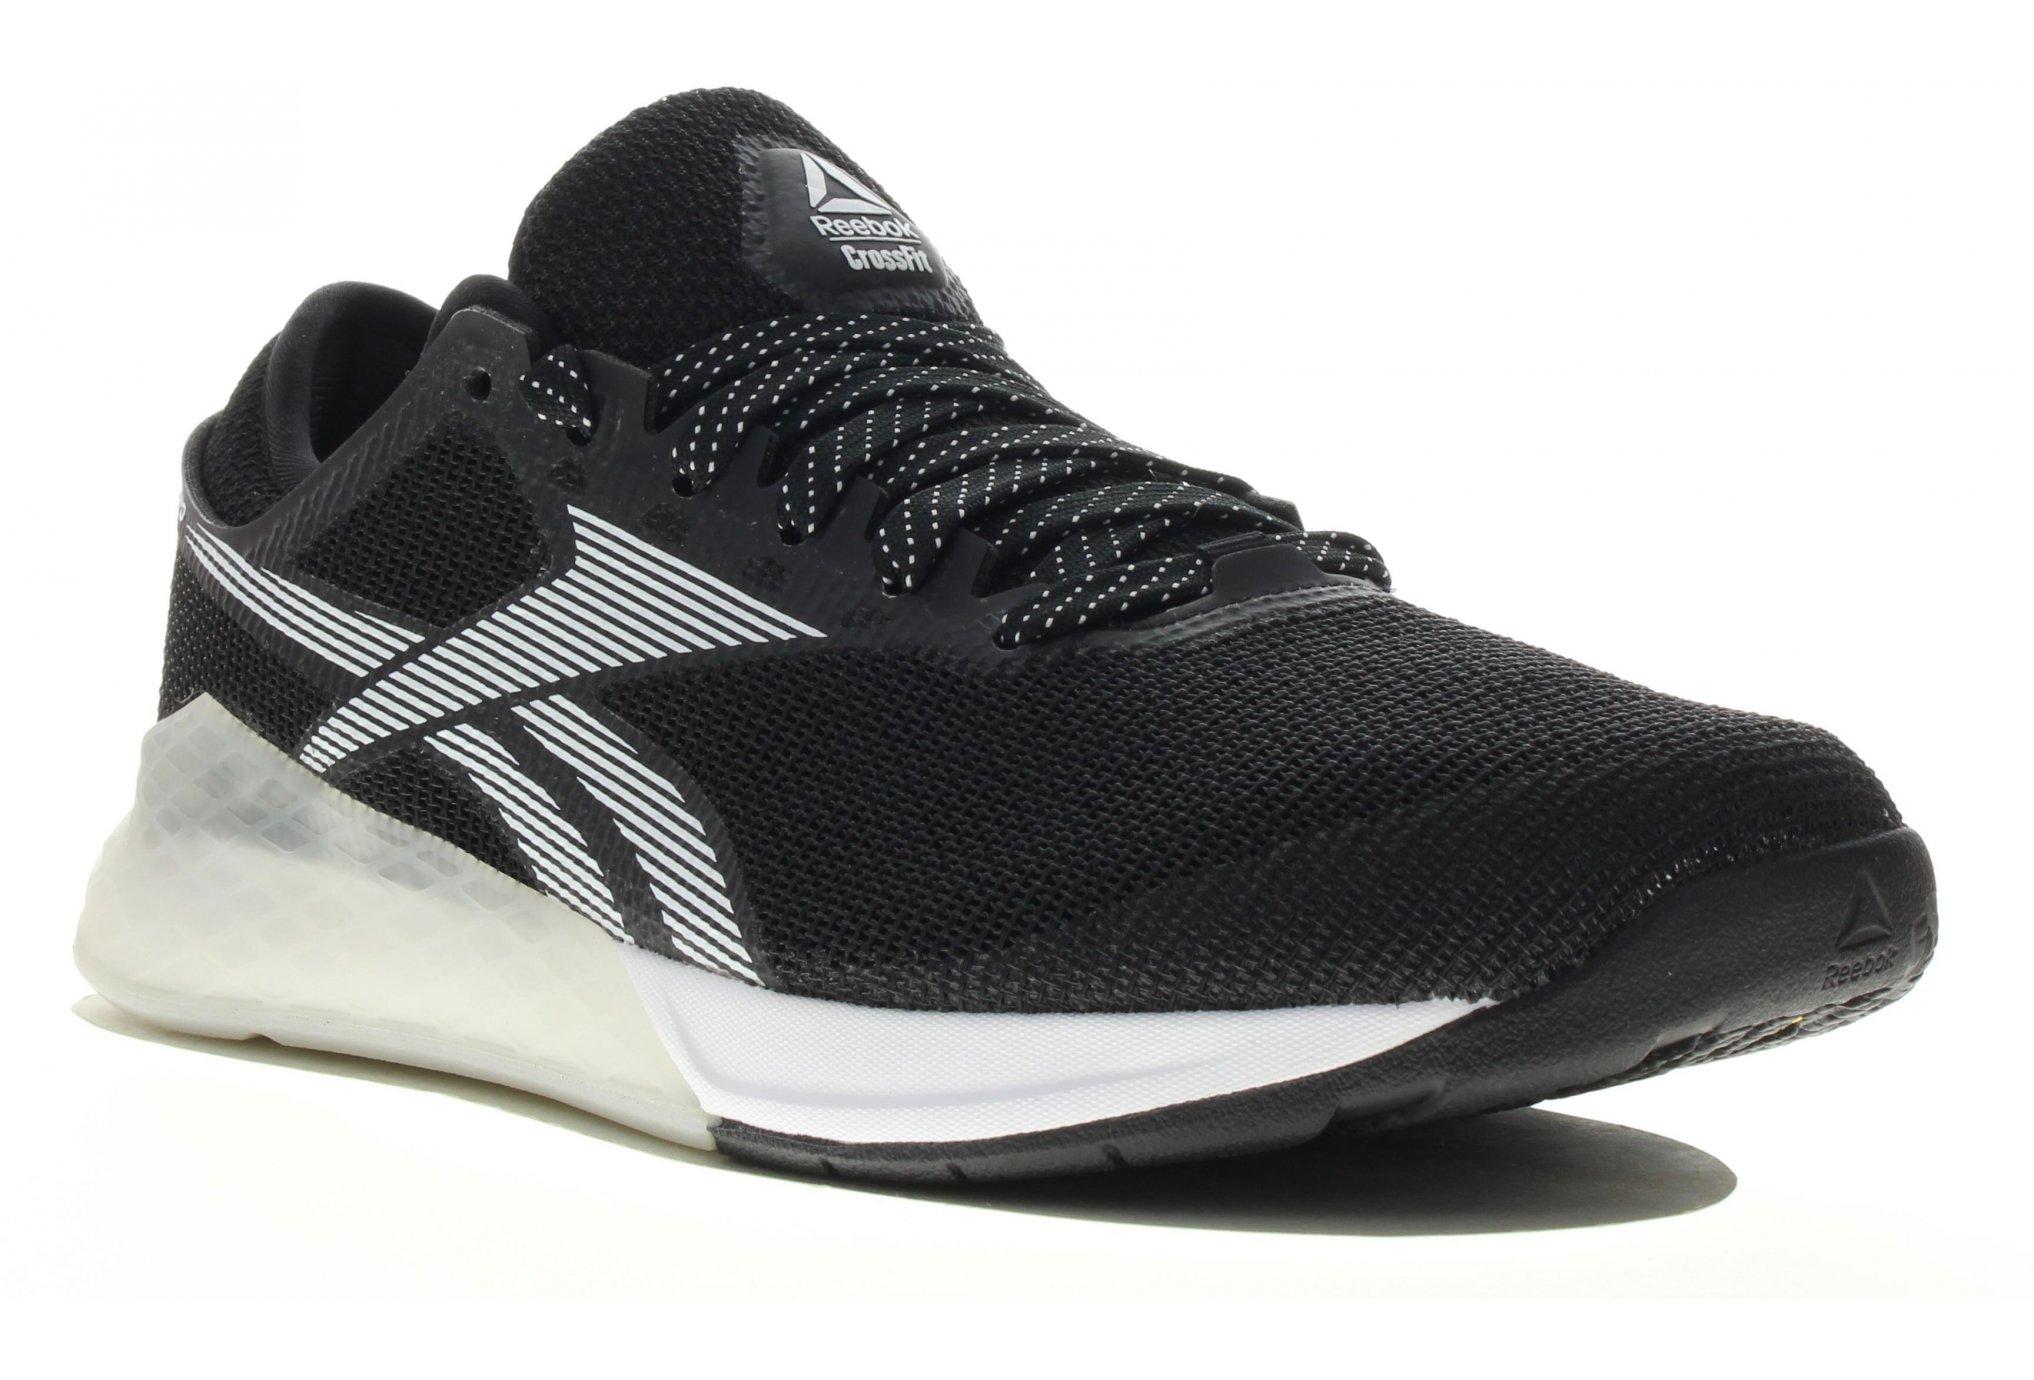 Reebok Nano 9 W Diététique Chaussures femme